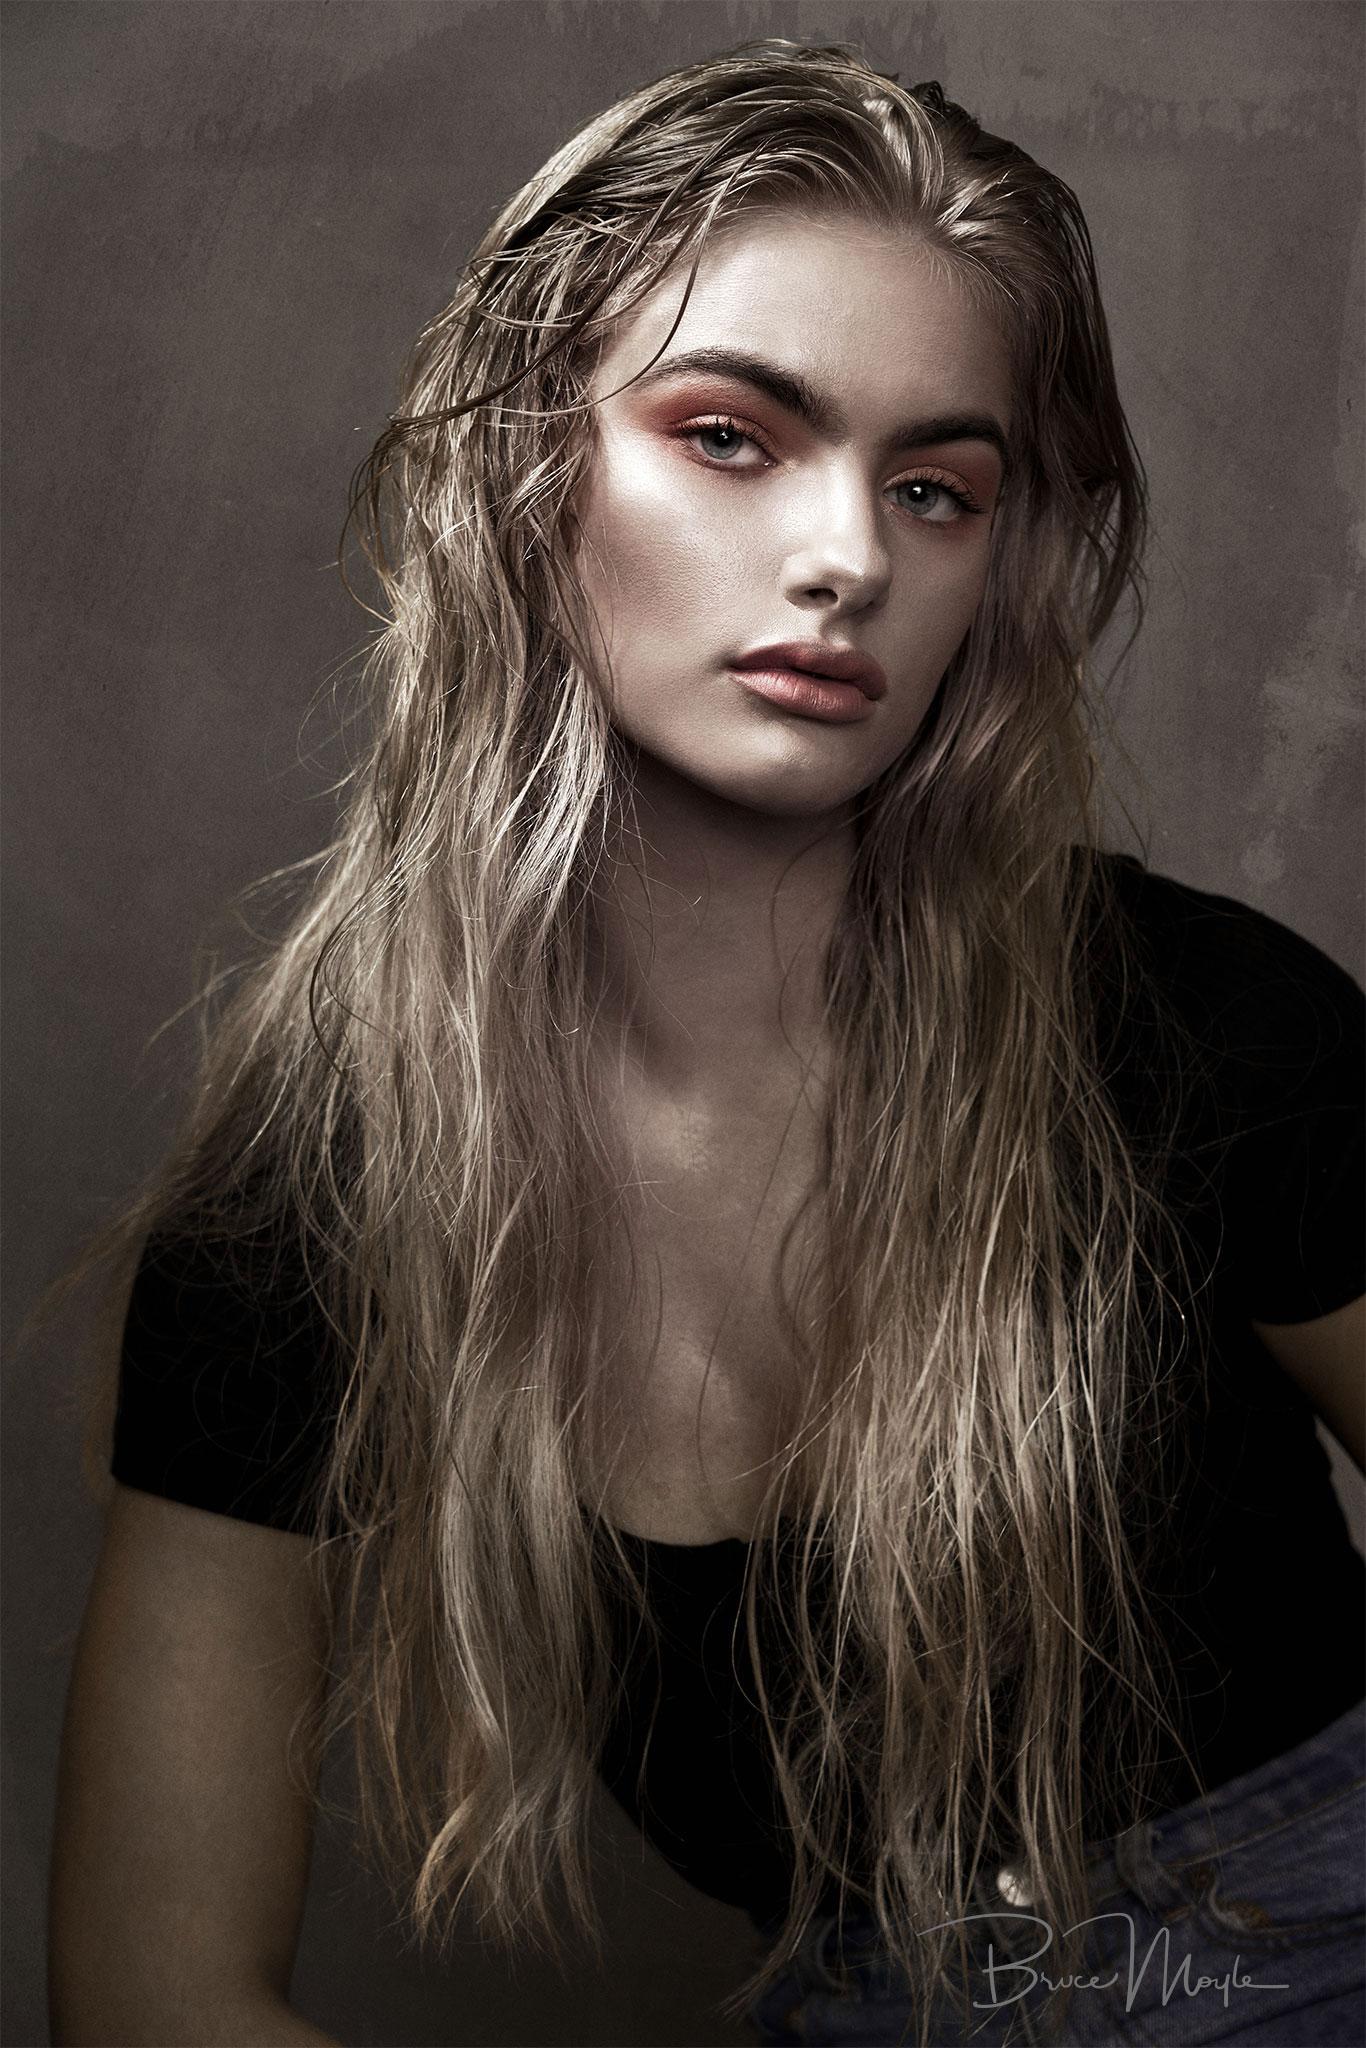 AAI004---Clare-Dornauf-Hair-Shoot---094.jpg